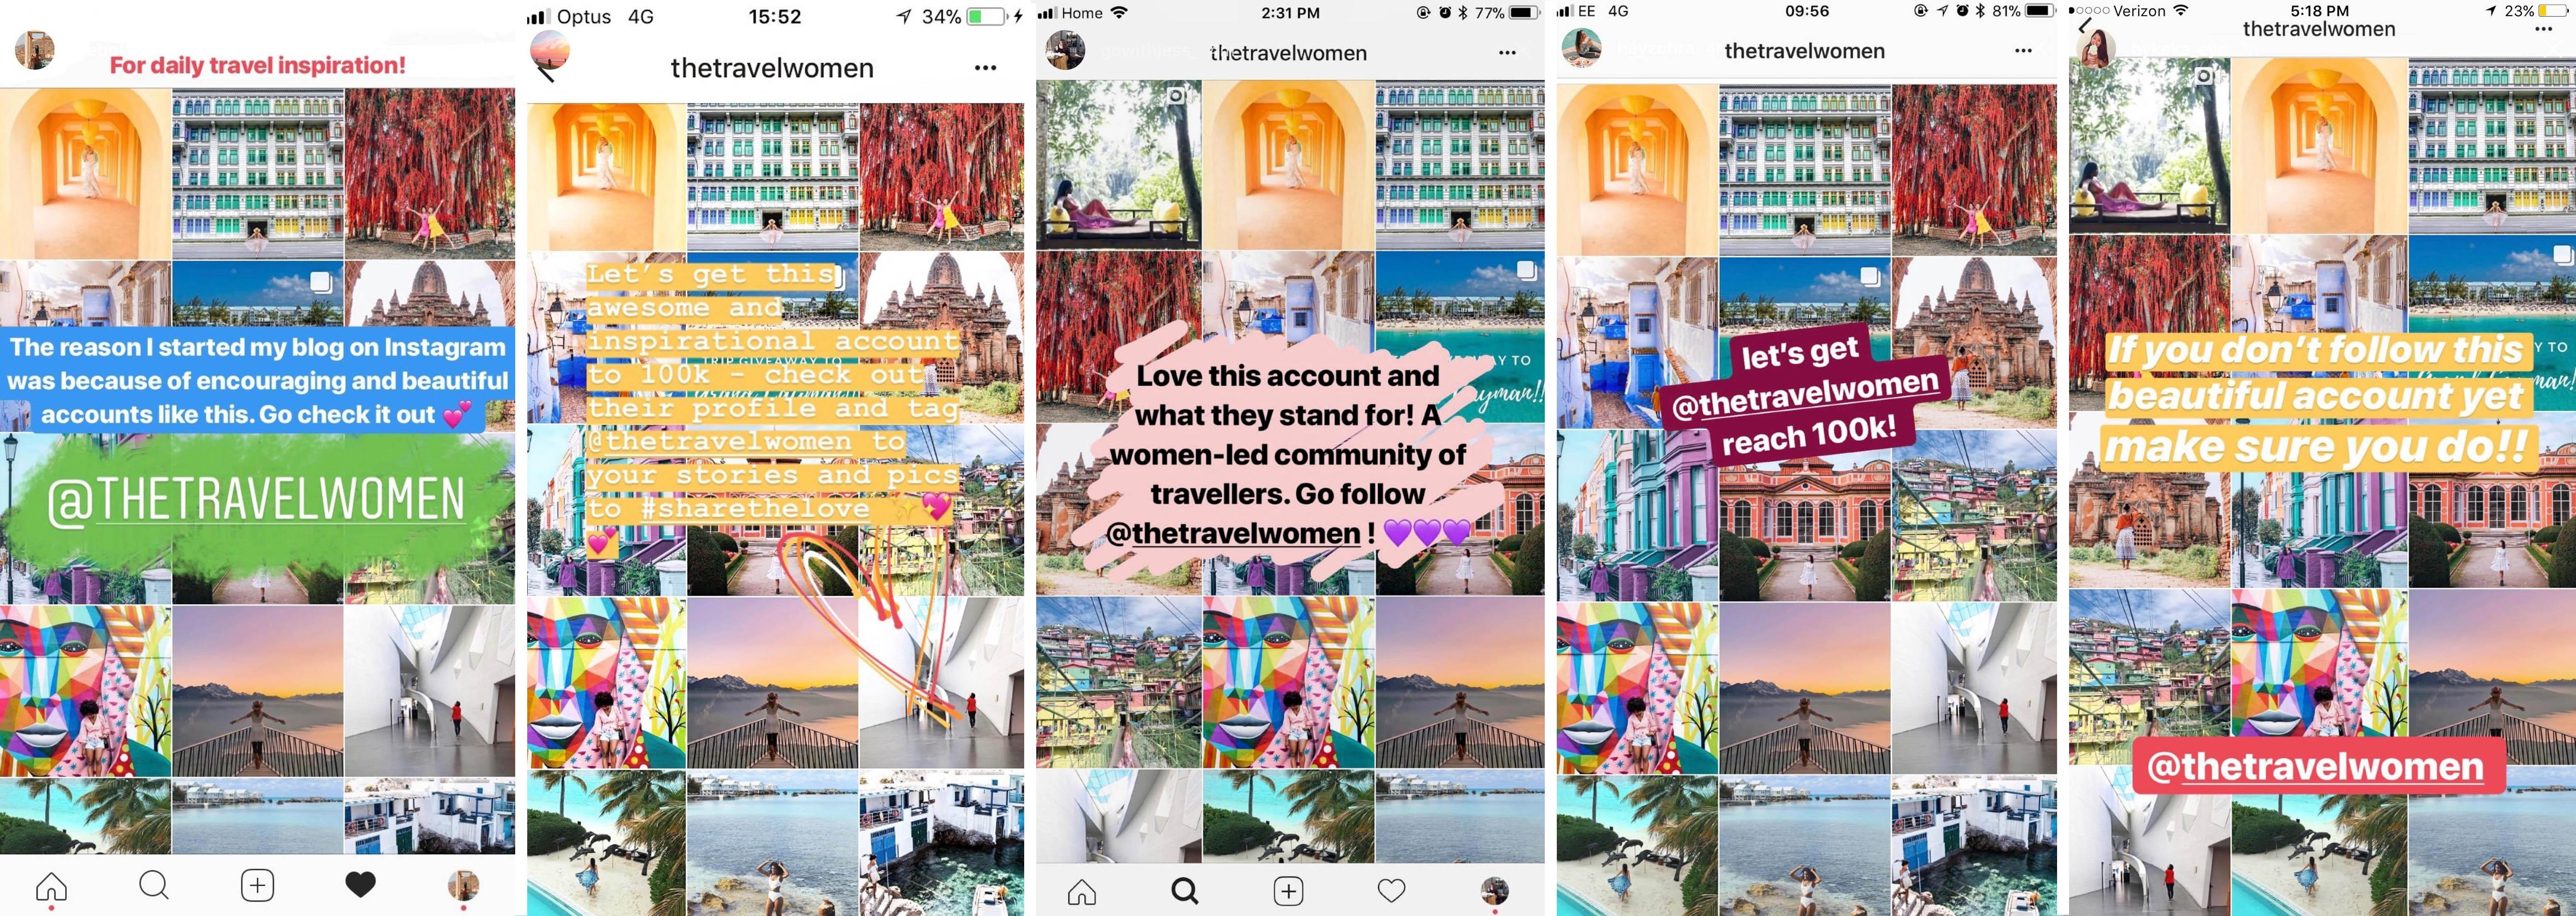 7 Ways To Be Featured on @TheTravelWomen Instagram